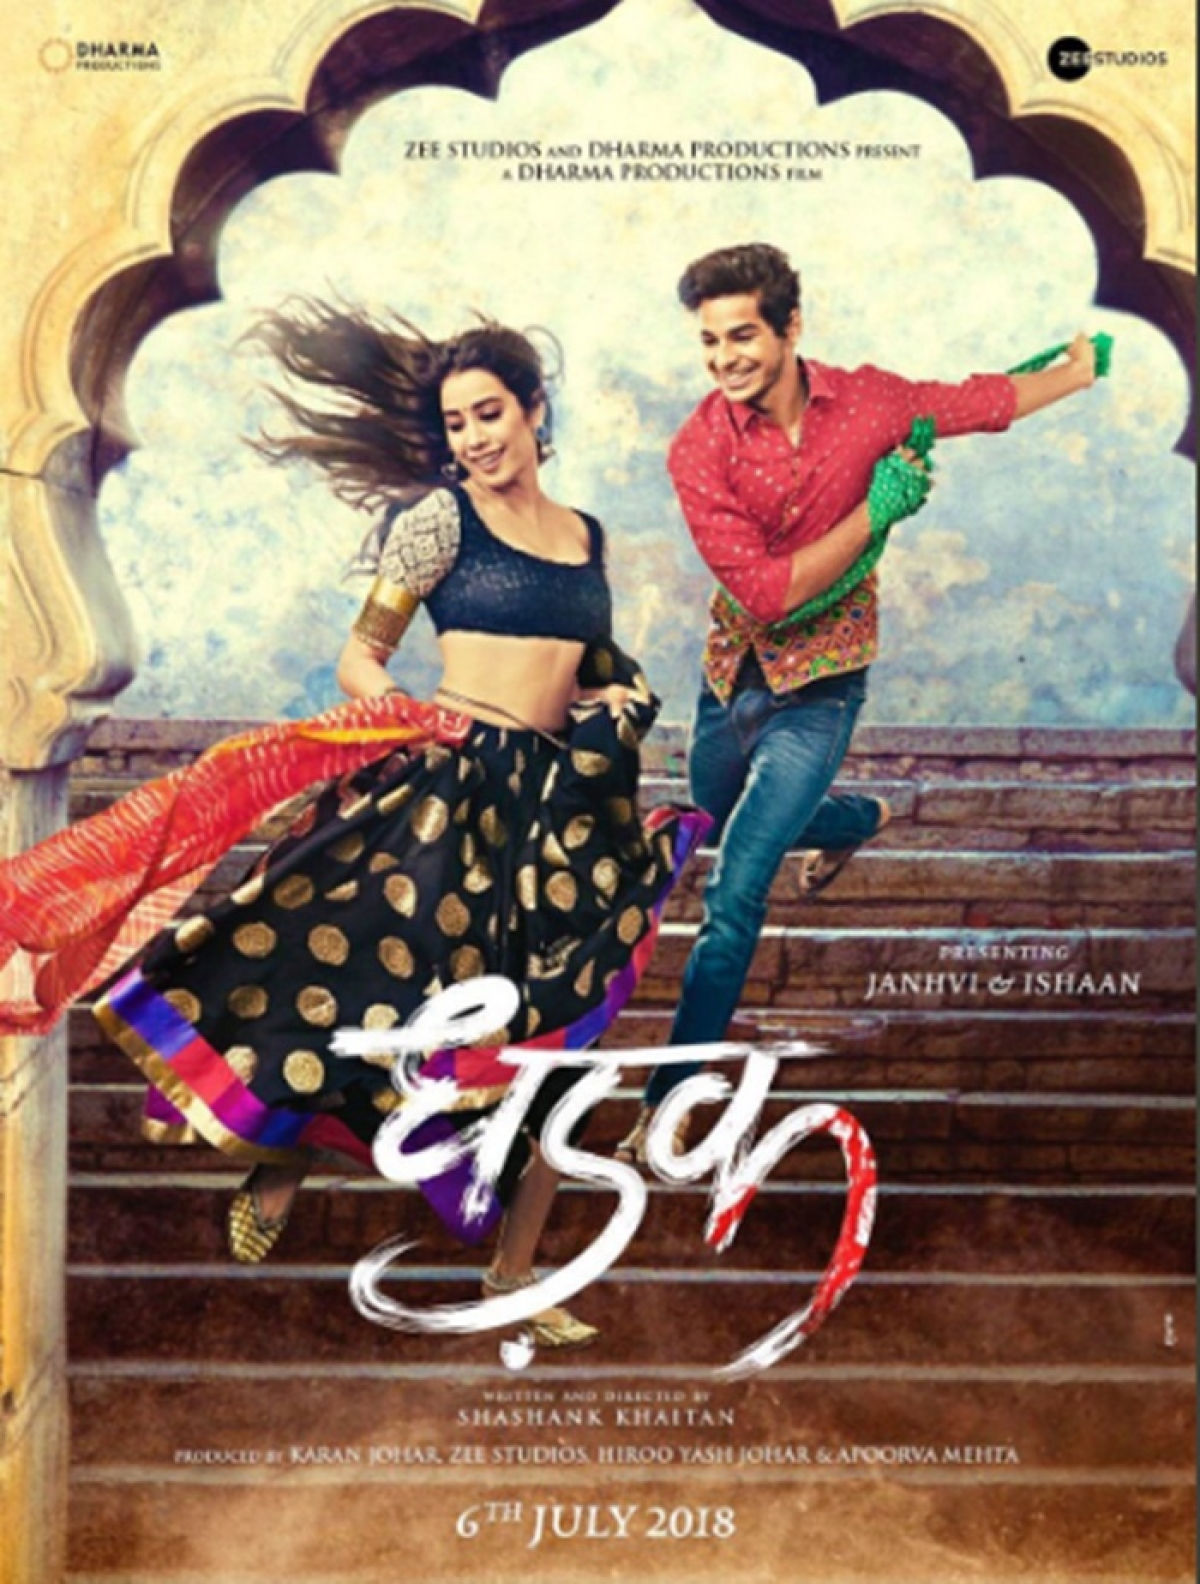 Dhadak: Karan Johar shares new poster of Janhvi Kapoor and Ishaan Khattar starrer; check it out